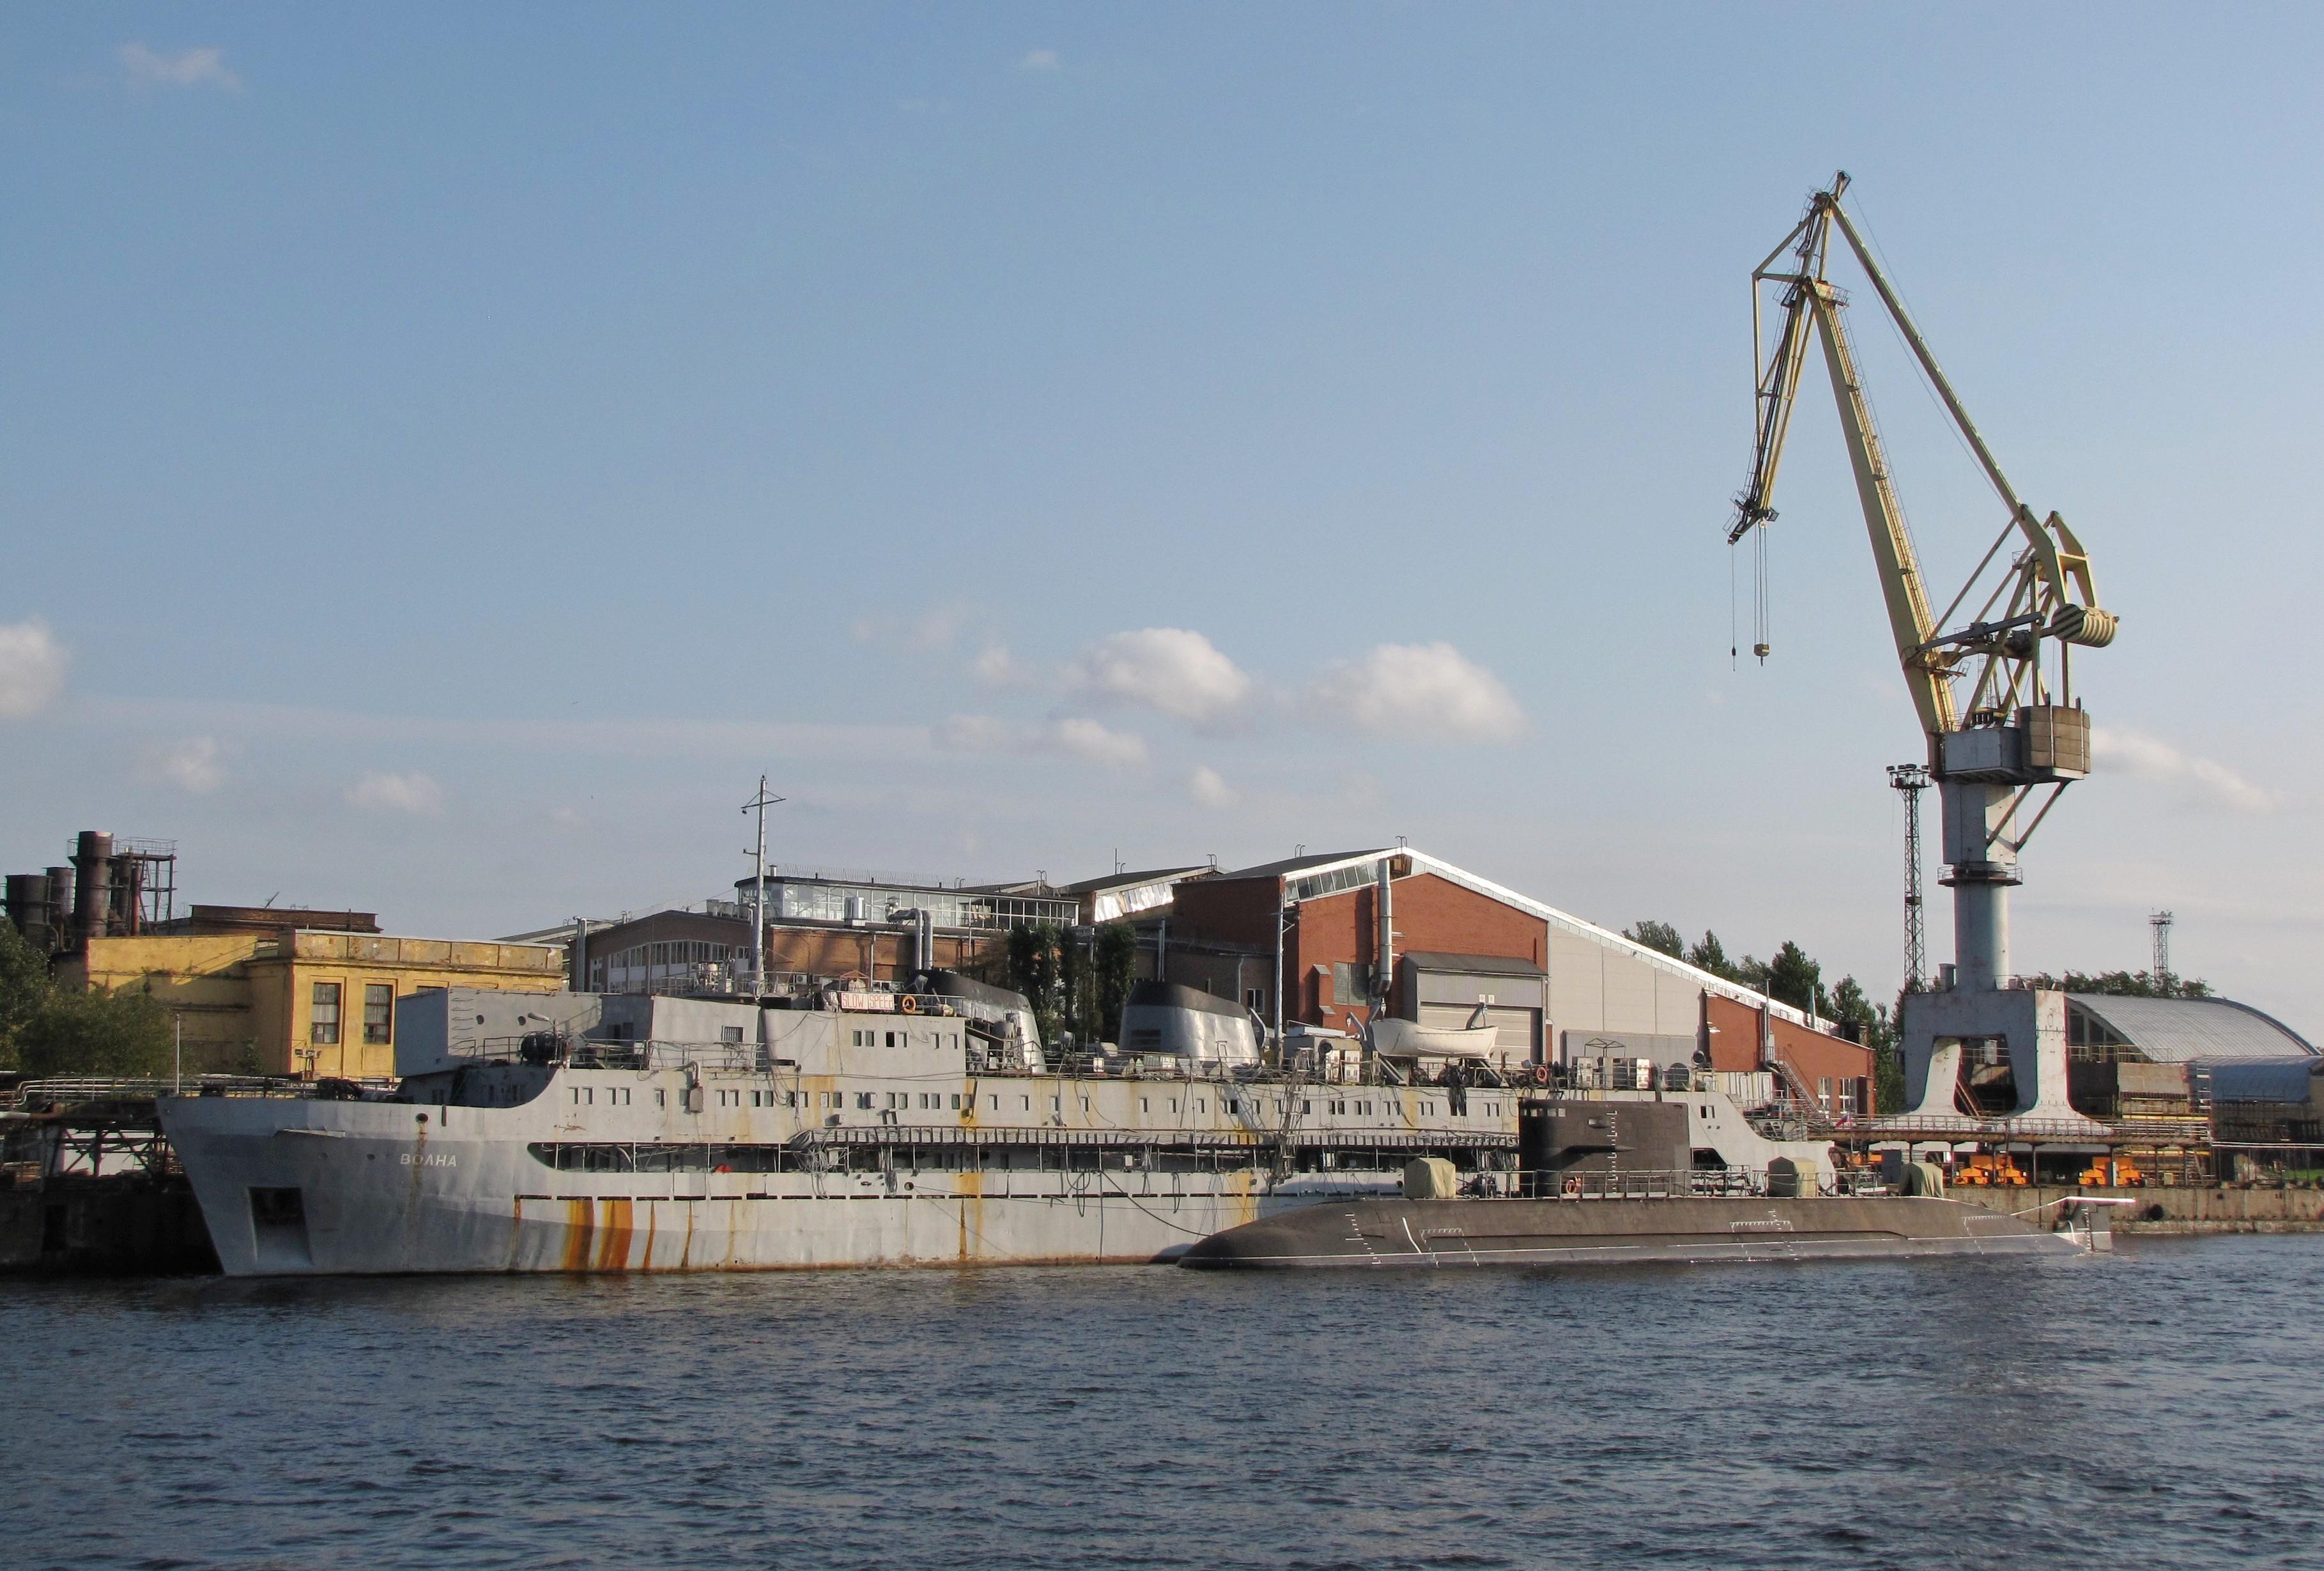 Project 677: Lada class Submarine - Page 15 04-6732449-677-napl-b-586-kronshtadt-u-eb-volna-22.09.2018